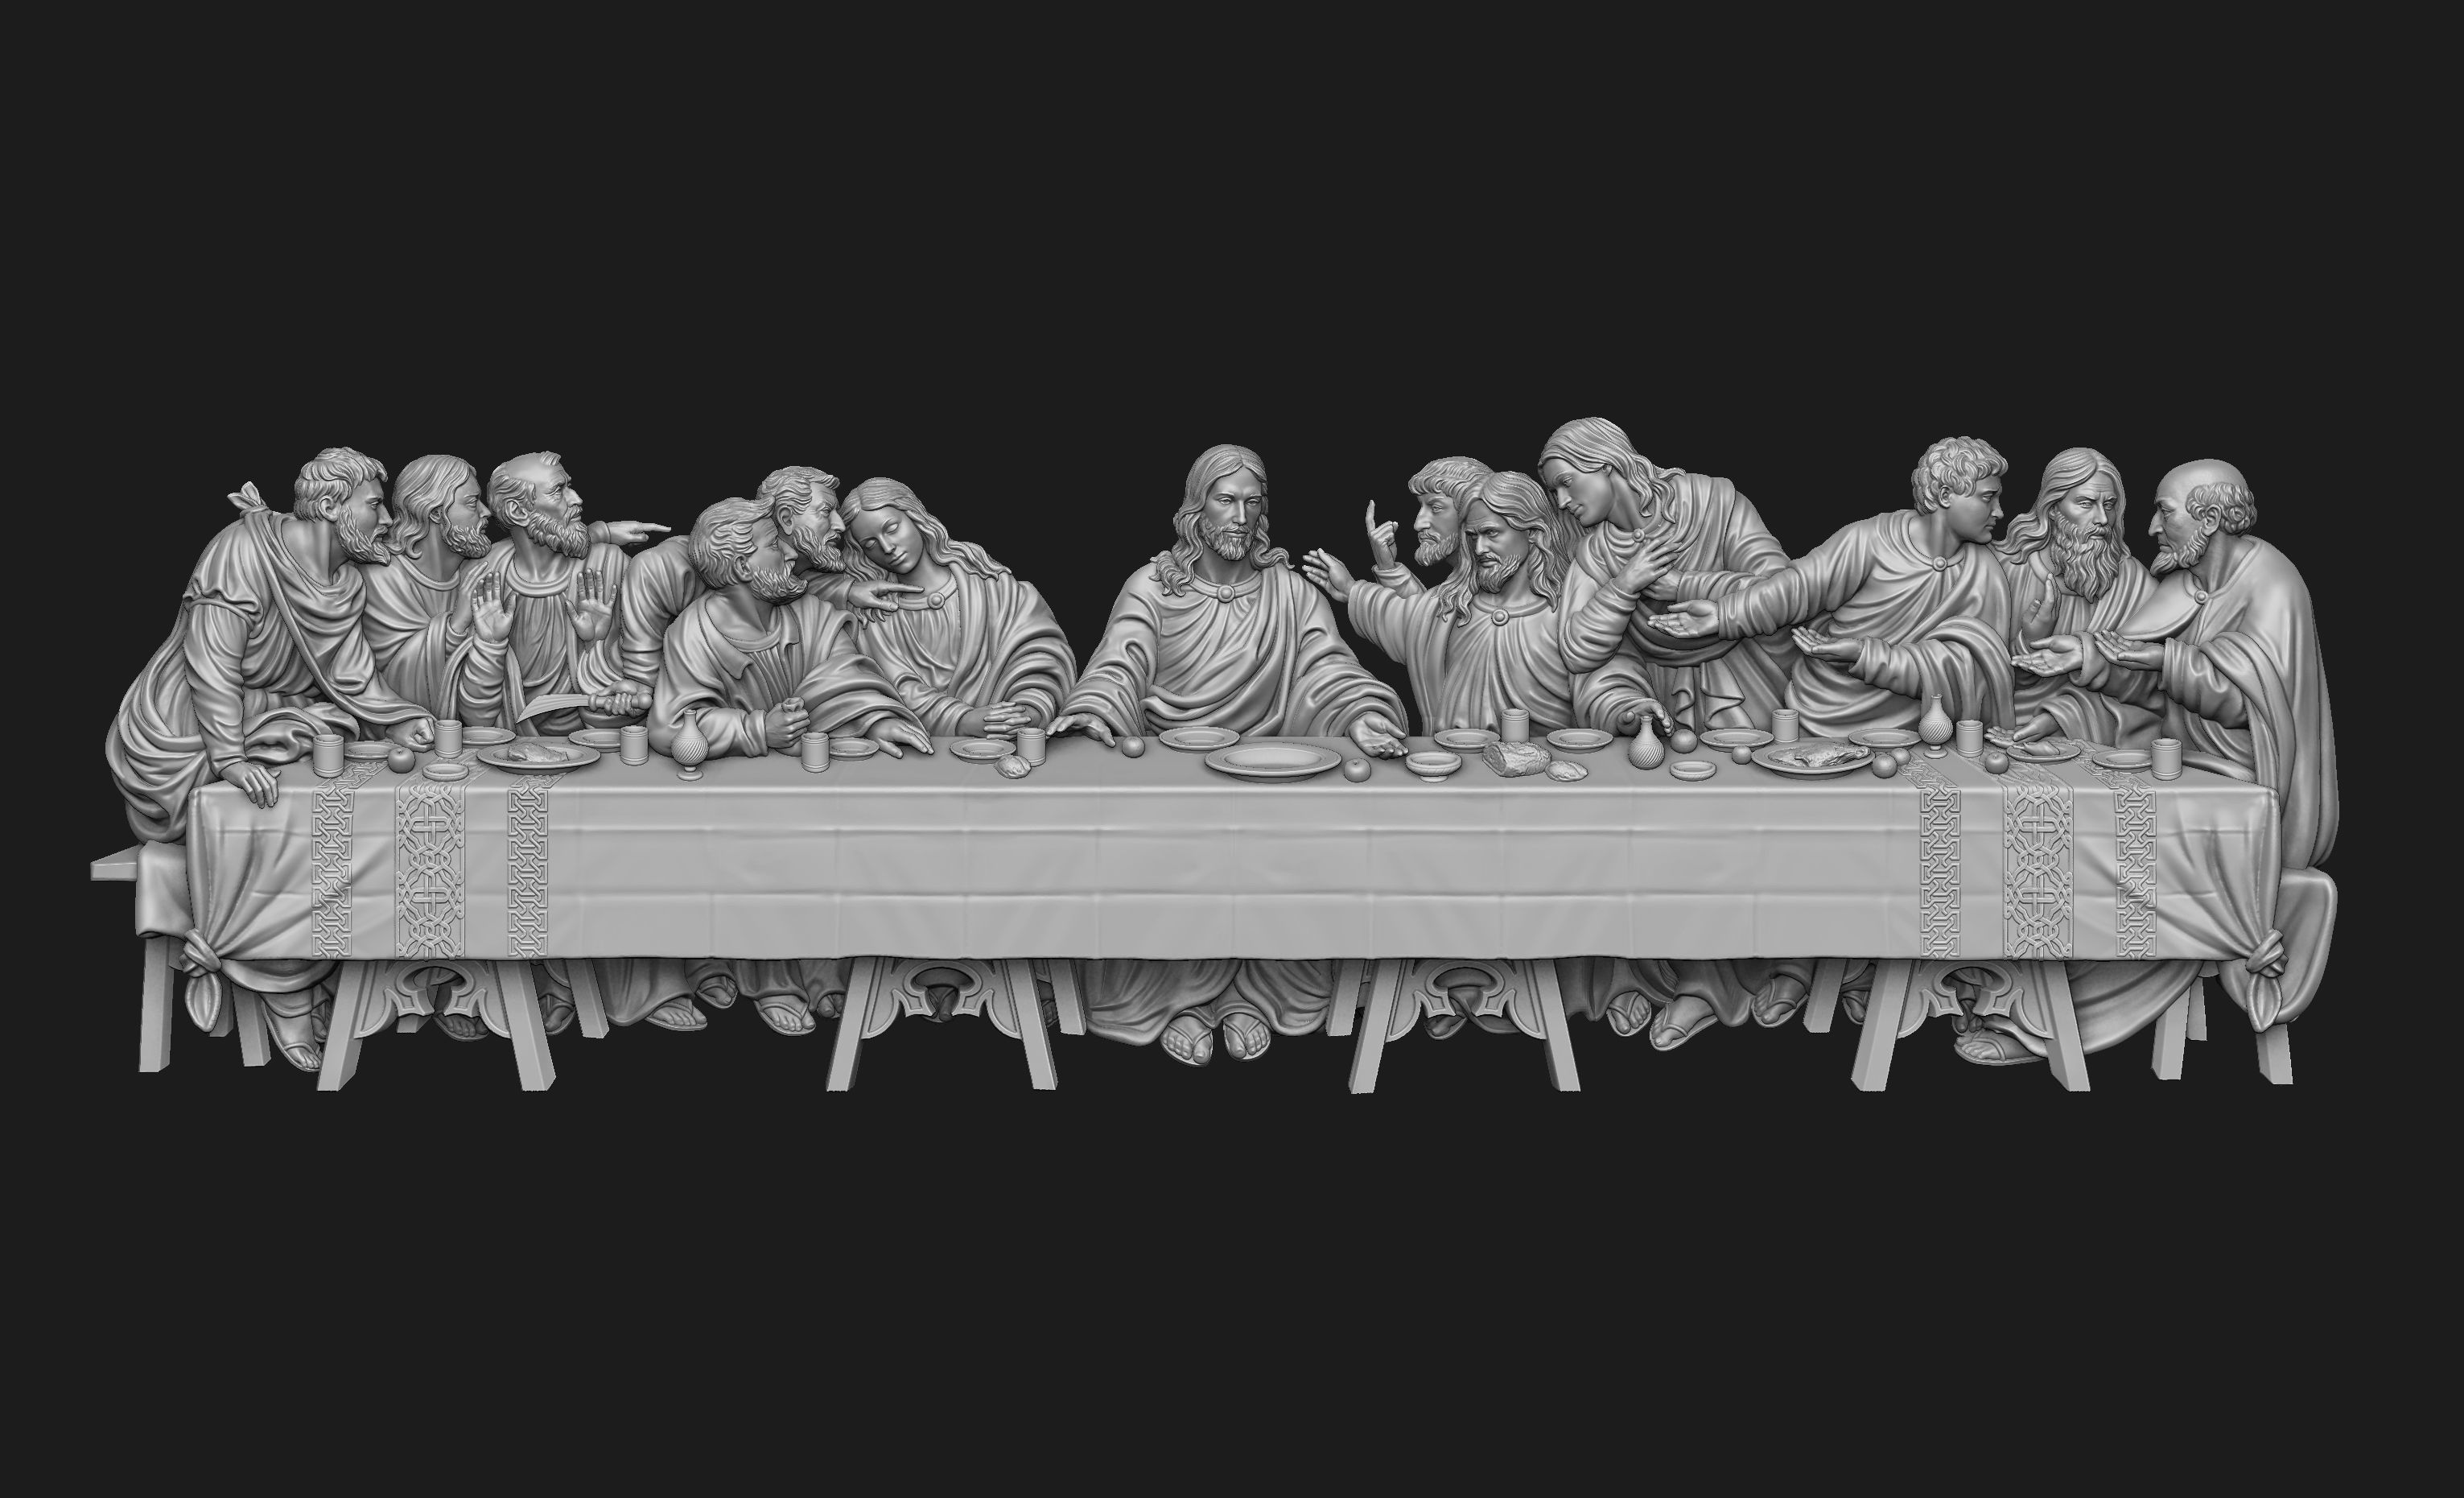 Last Supper Bas-Relief No Background